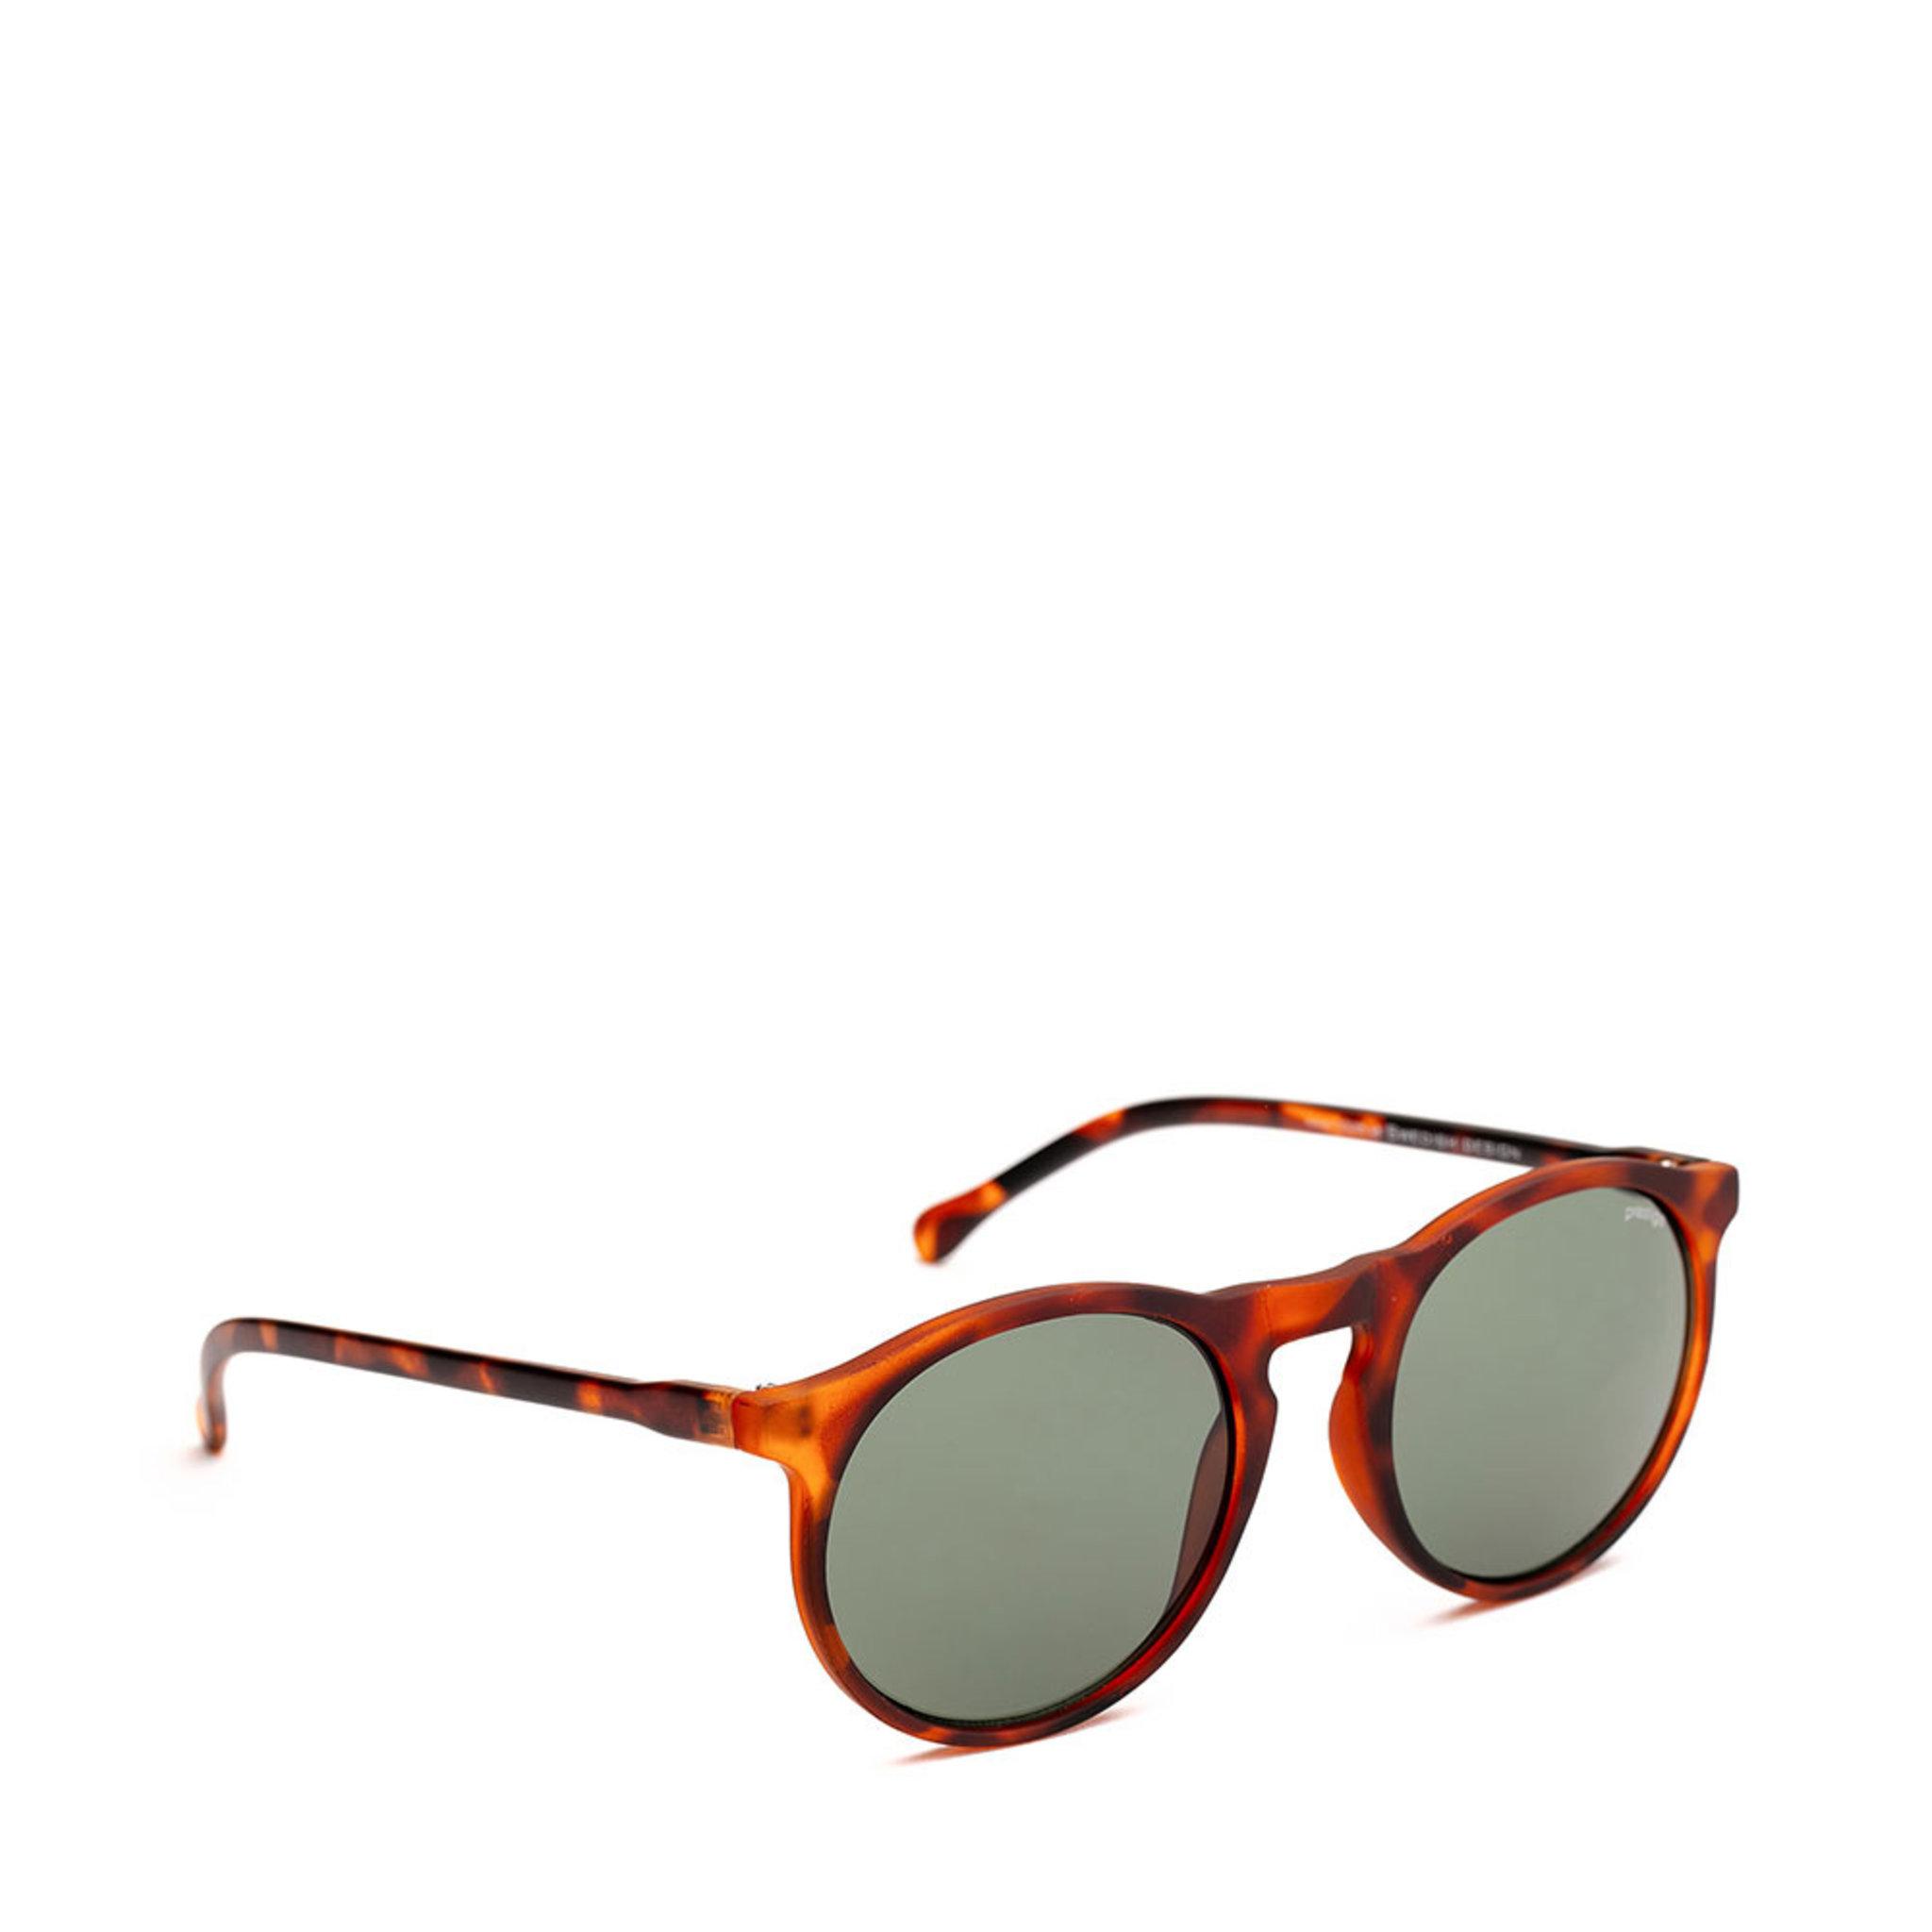 Solglasögon Tammy